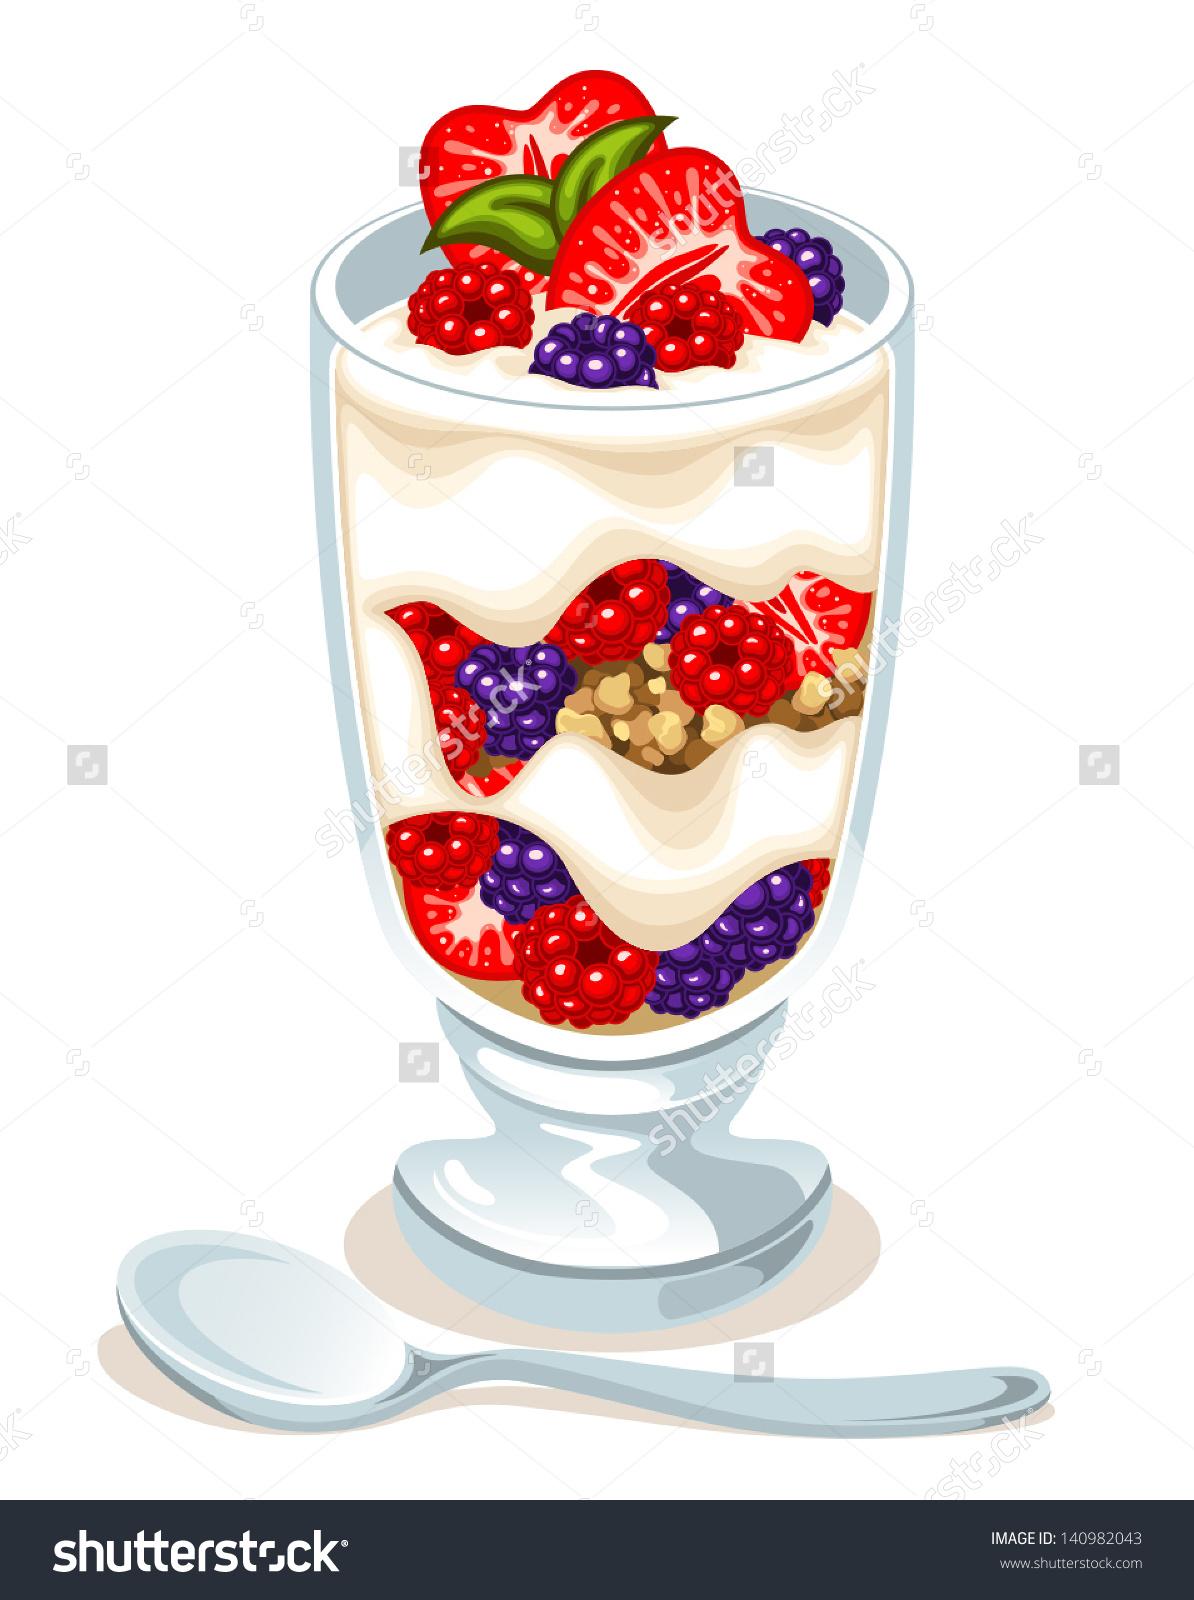 Vector Fruit Parfait Stock Vector 140982043.